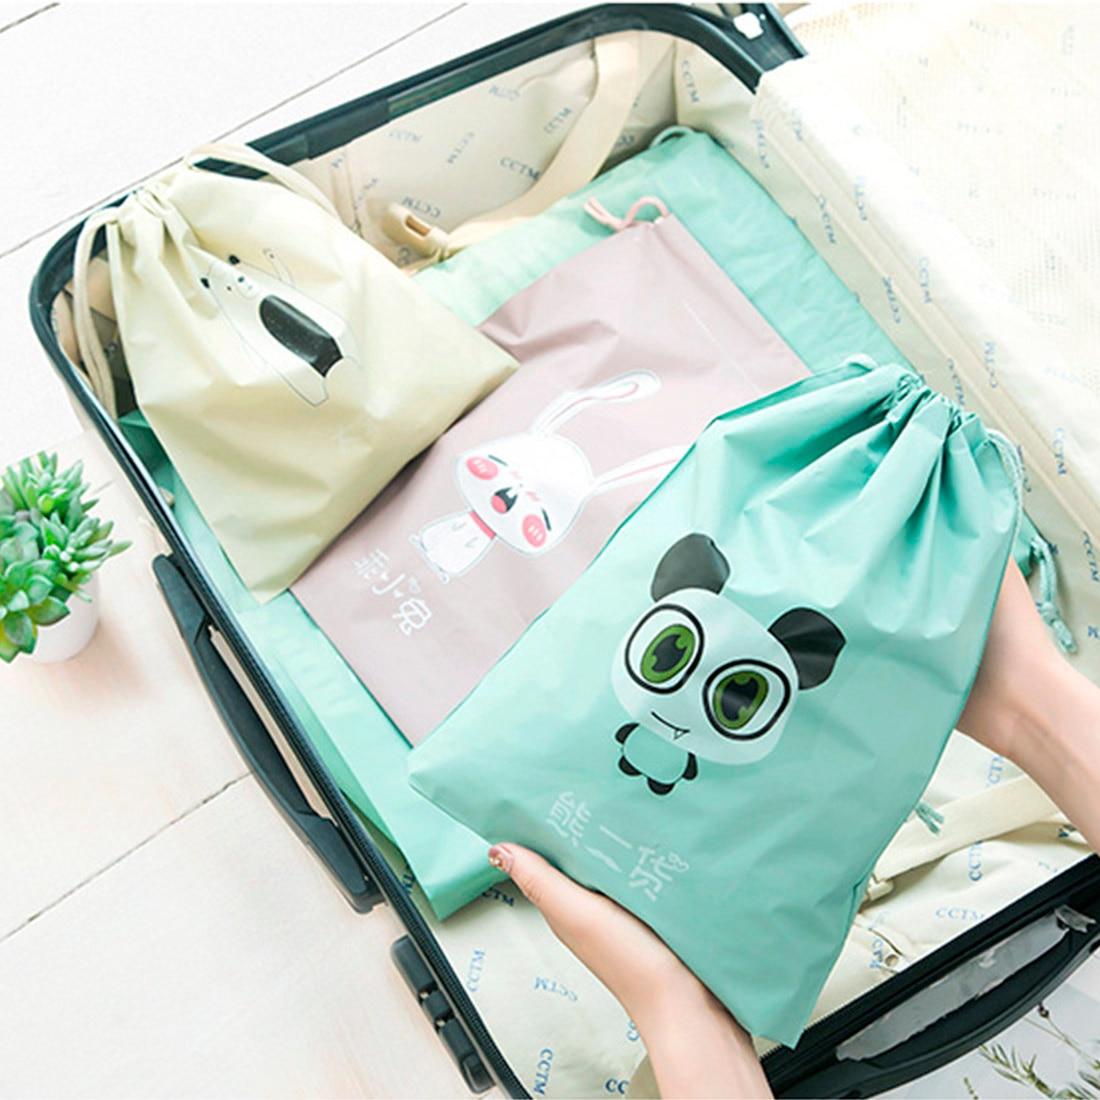 Portable Printing Drawstring Bag Beam Port Storage Shopping Travel Handbag Xmas Gift Bags in Drawstring Bags from Luggage Bags